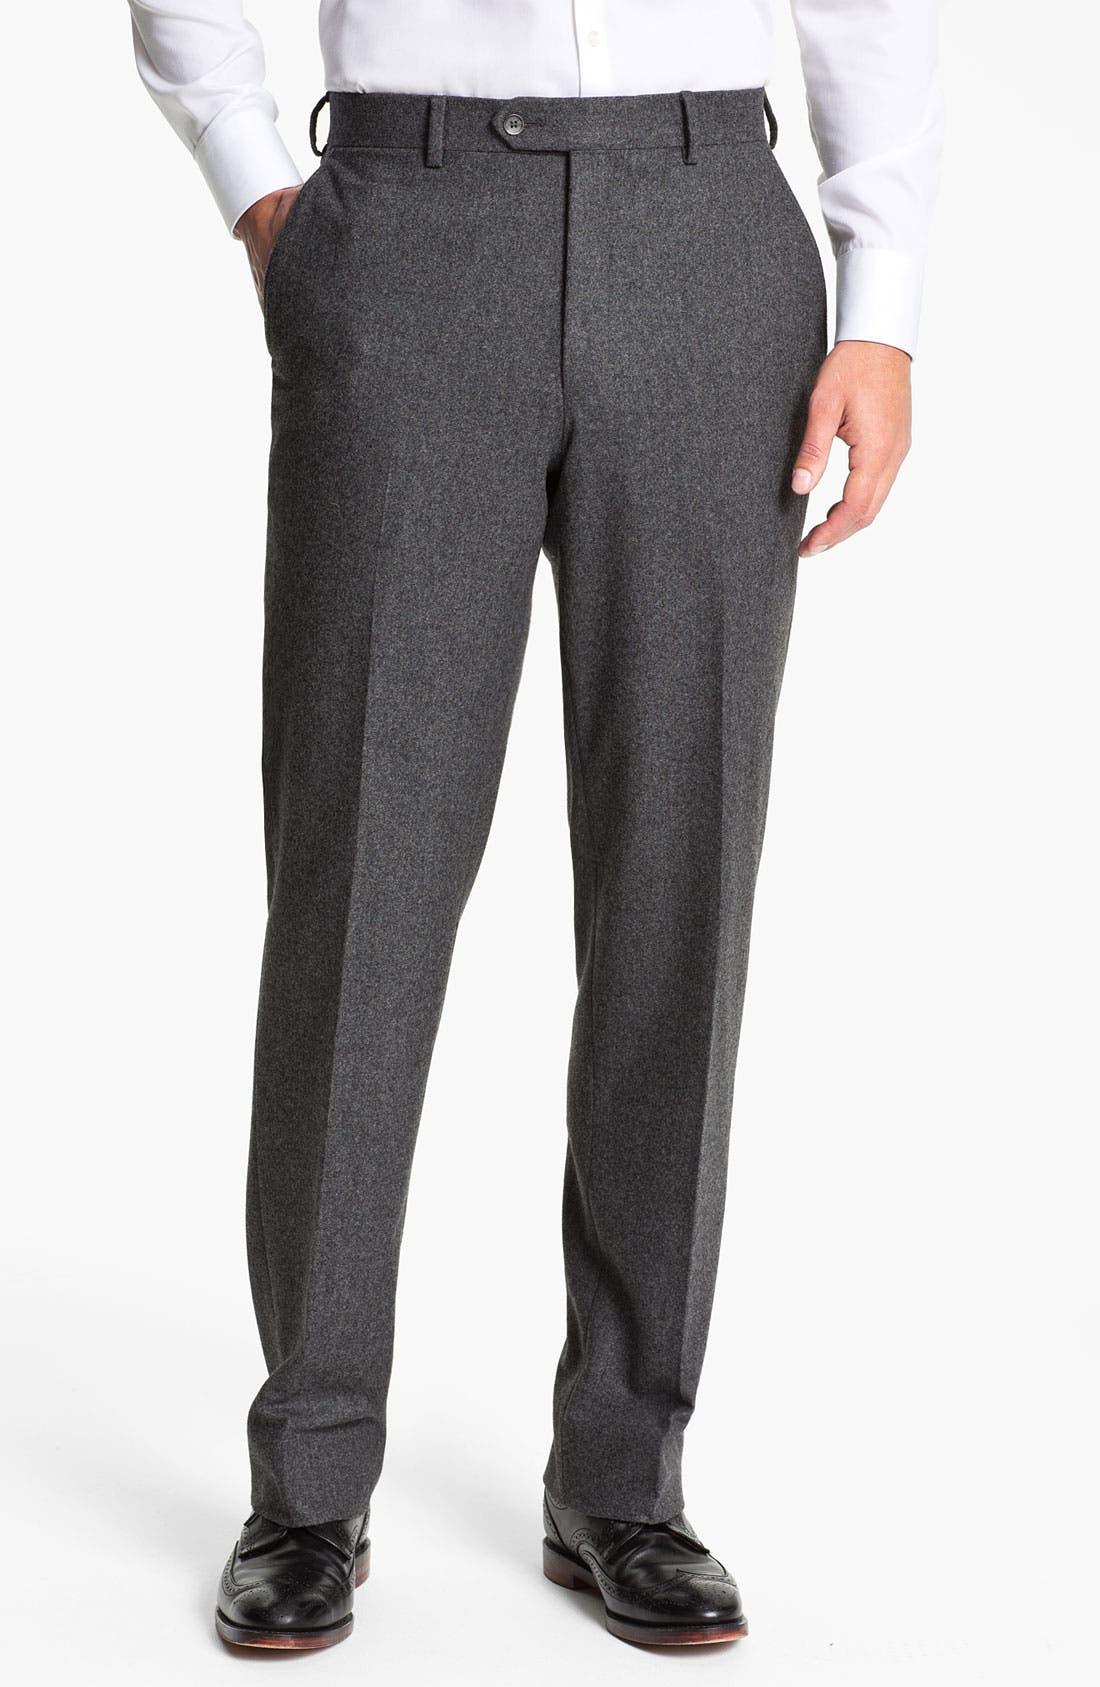 Alternate Image 1 Selected - Robert Talbott Flat Front Wool Trousers